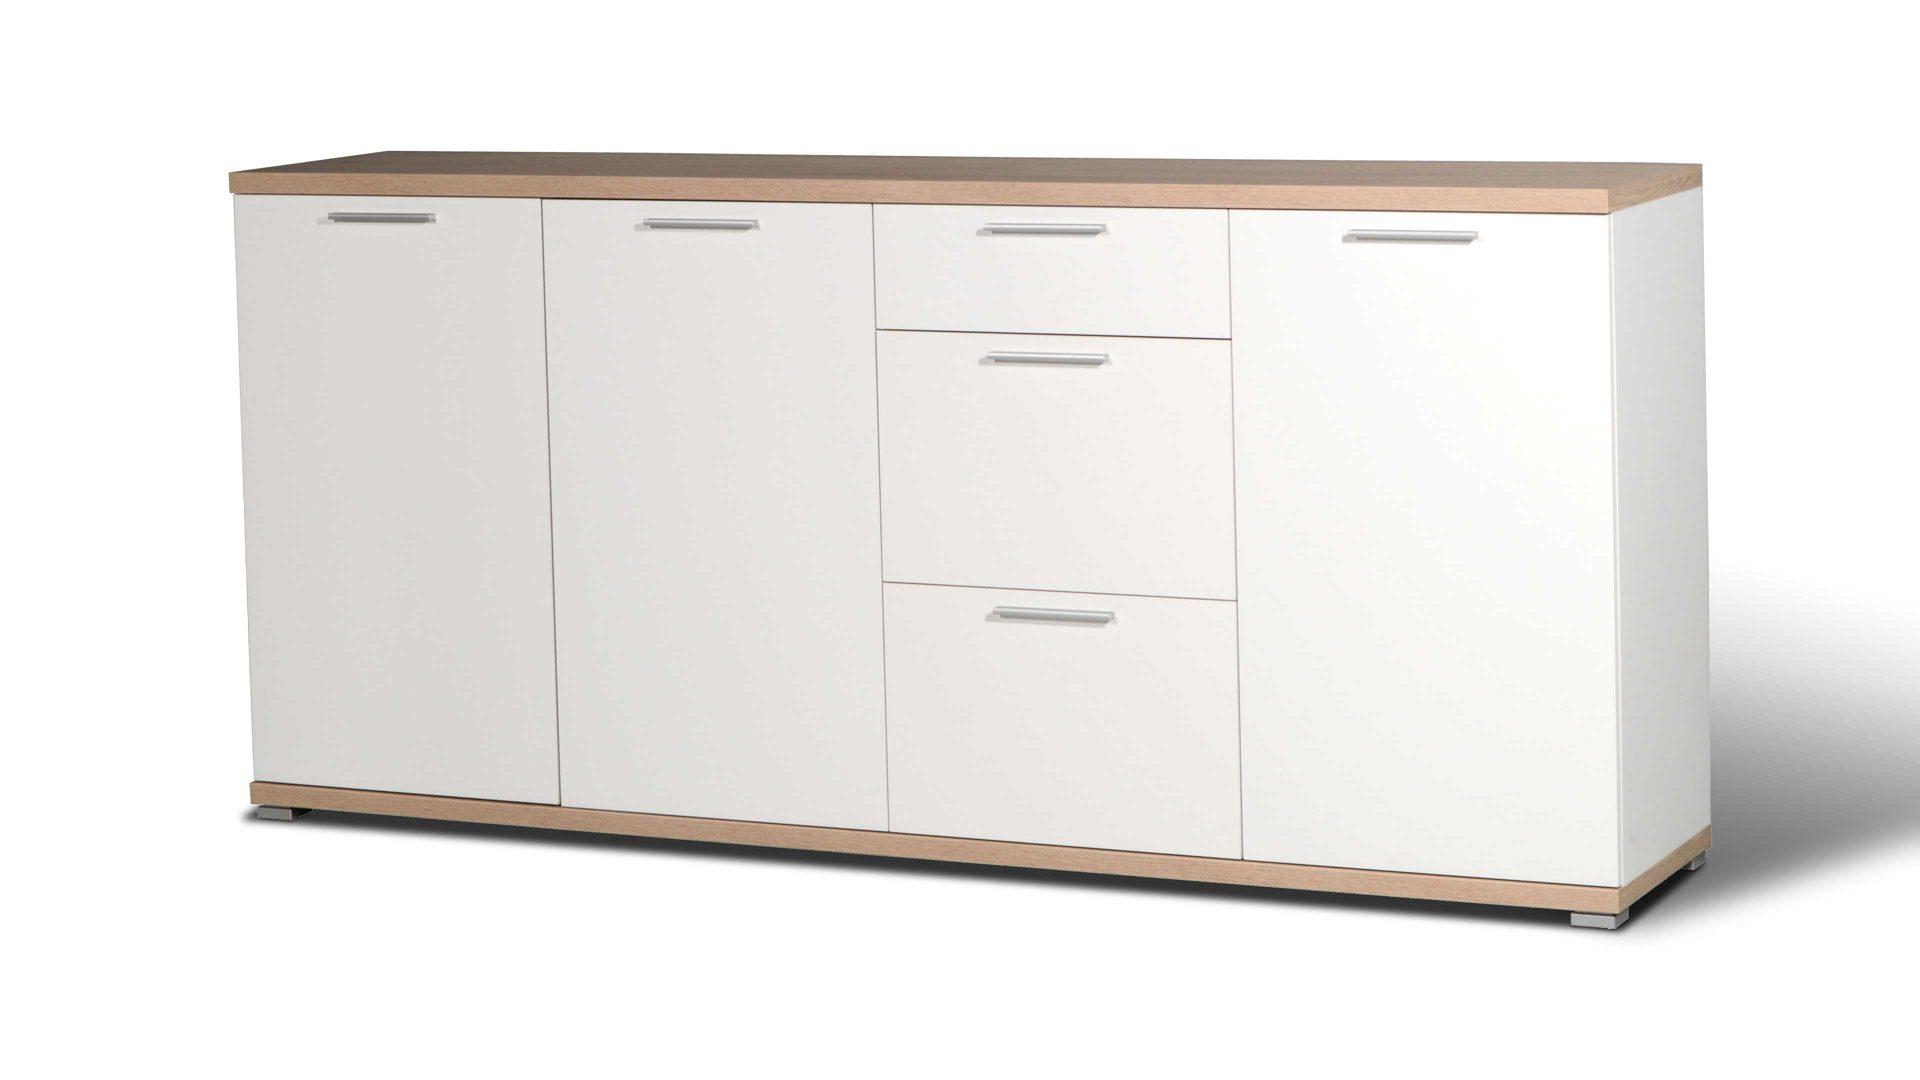 Mobel Bock Mobel A Z Regale Raumteiler Schuhregale Sideboard